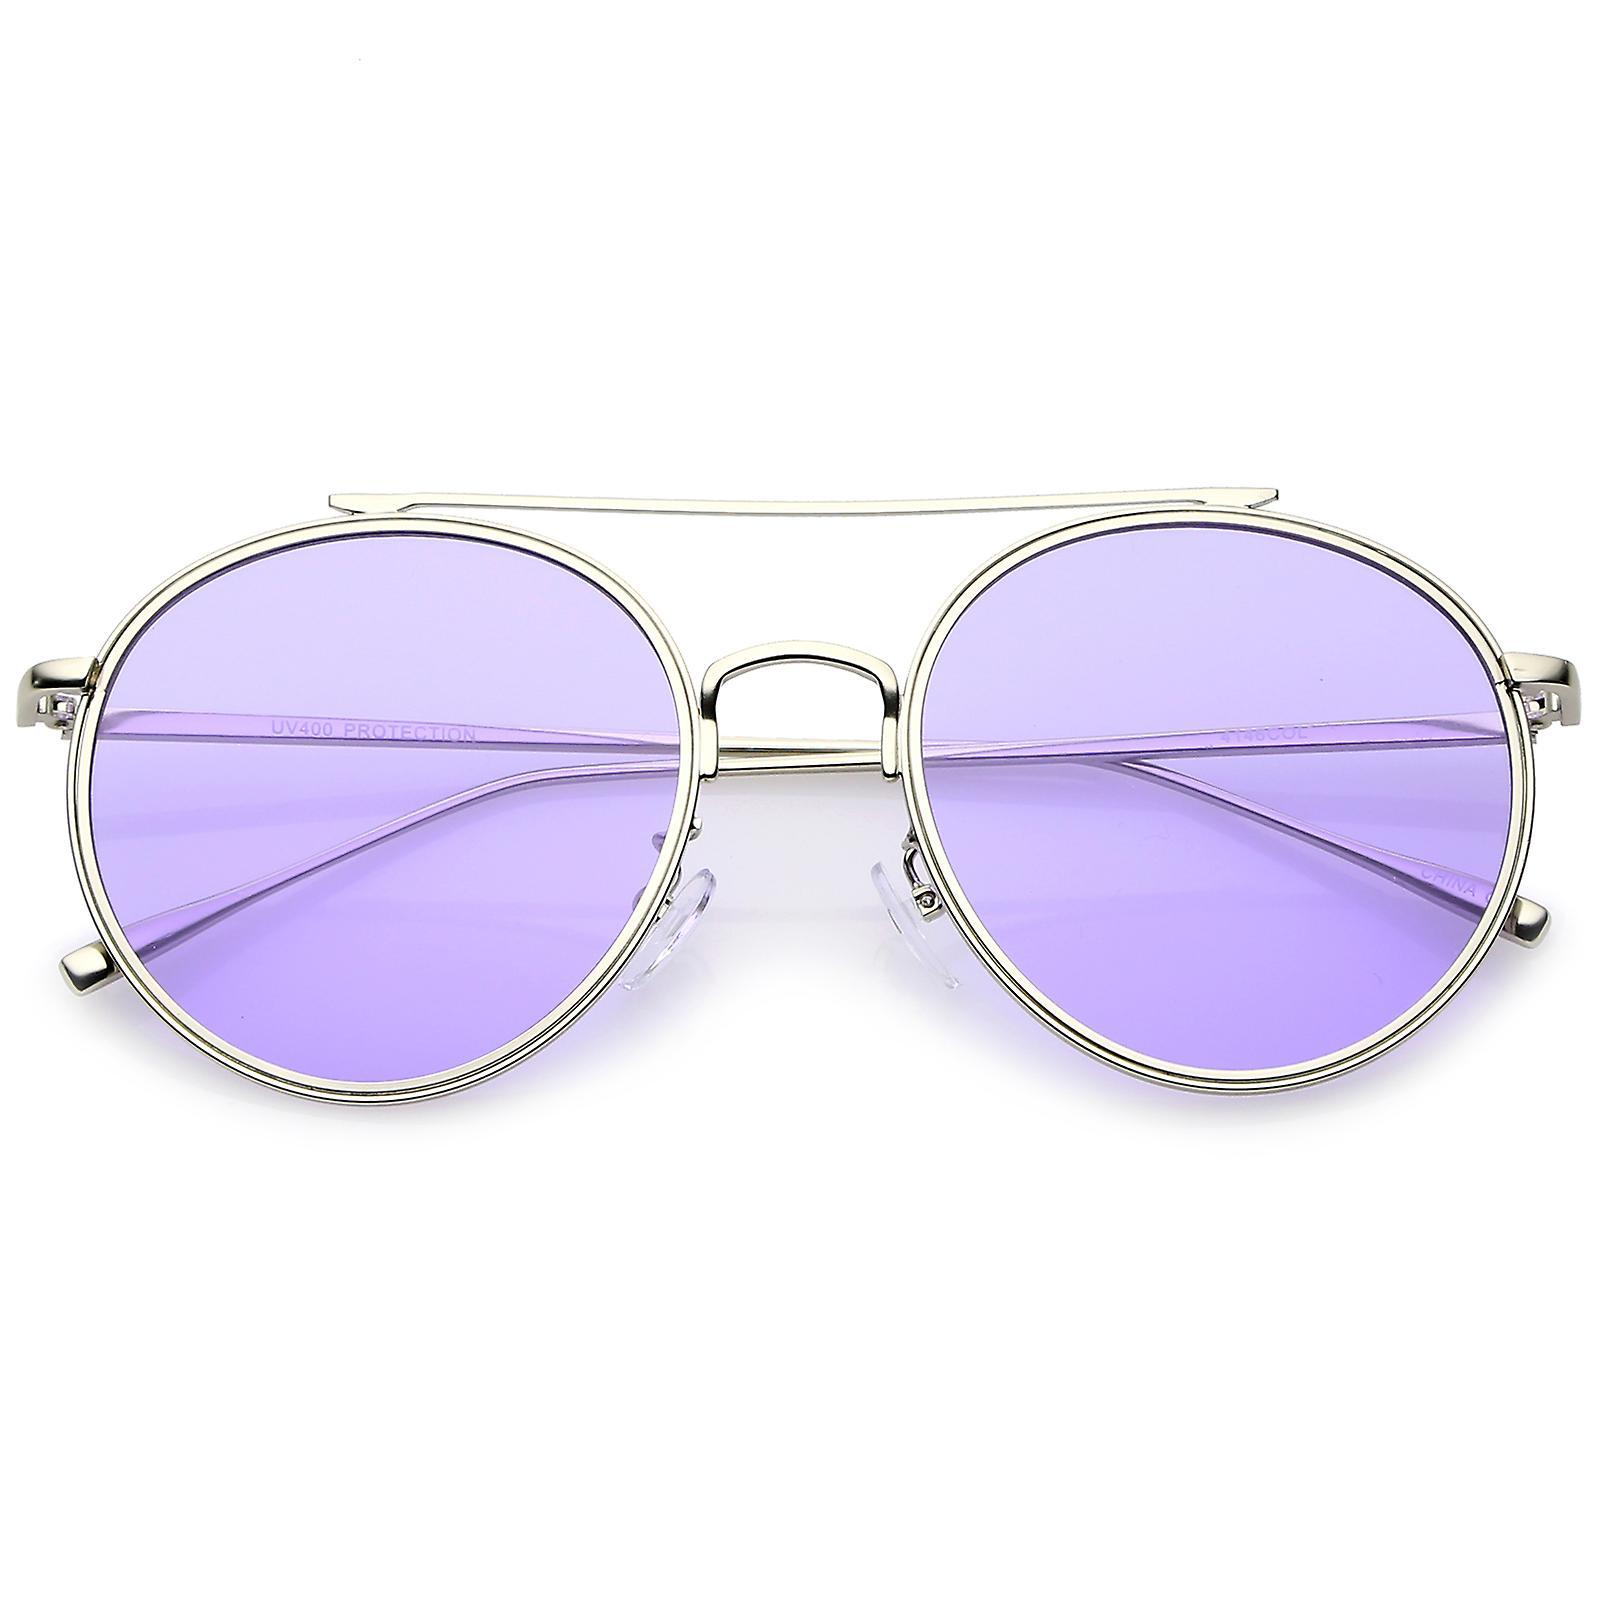 55df4a5b7e2 Modern Metal Crossbar Slim Temple Colored Flat Lens Round Aviator  Sunglasses 54mm